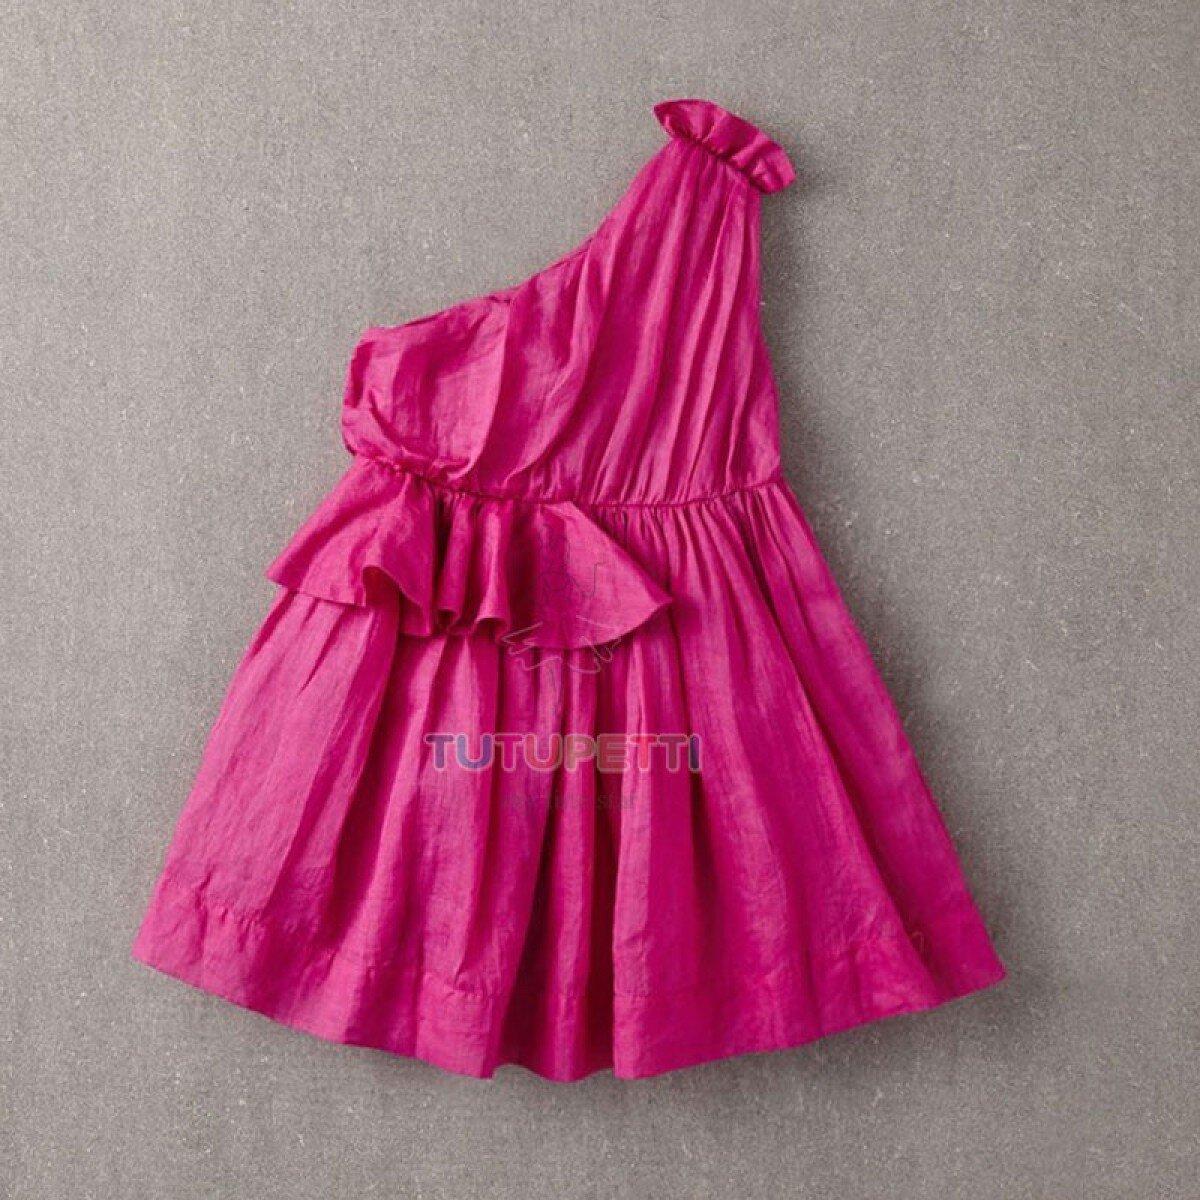 Đầm bé gái lệch vai Poppy 16323